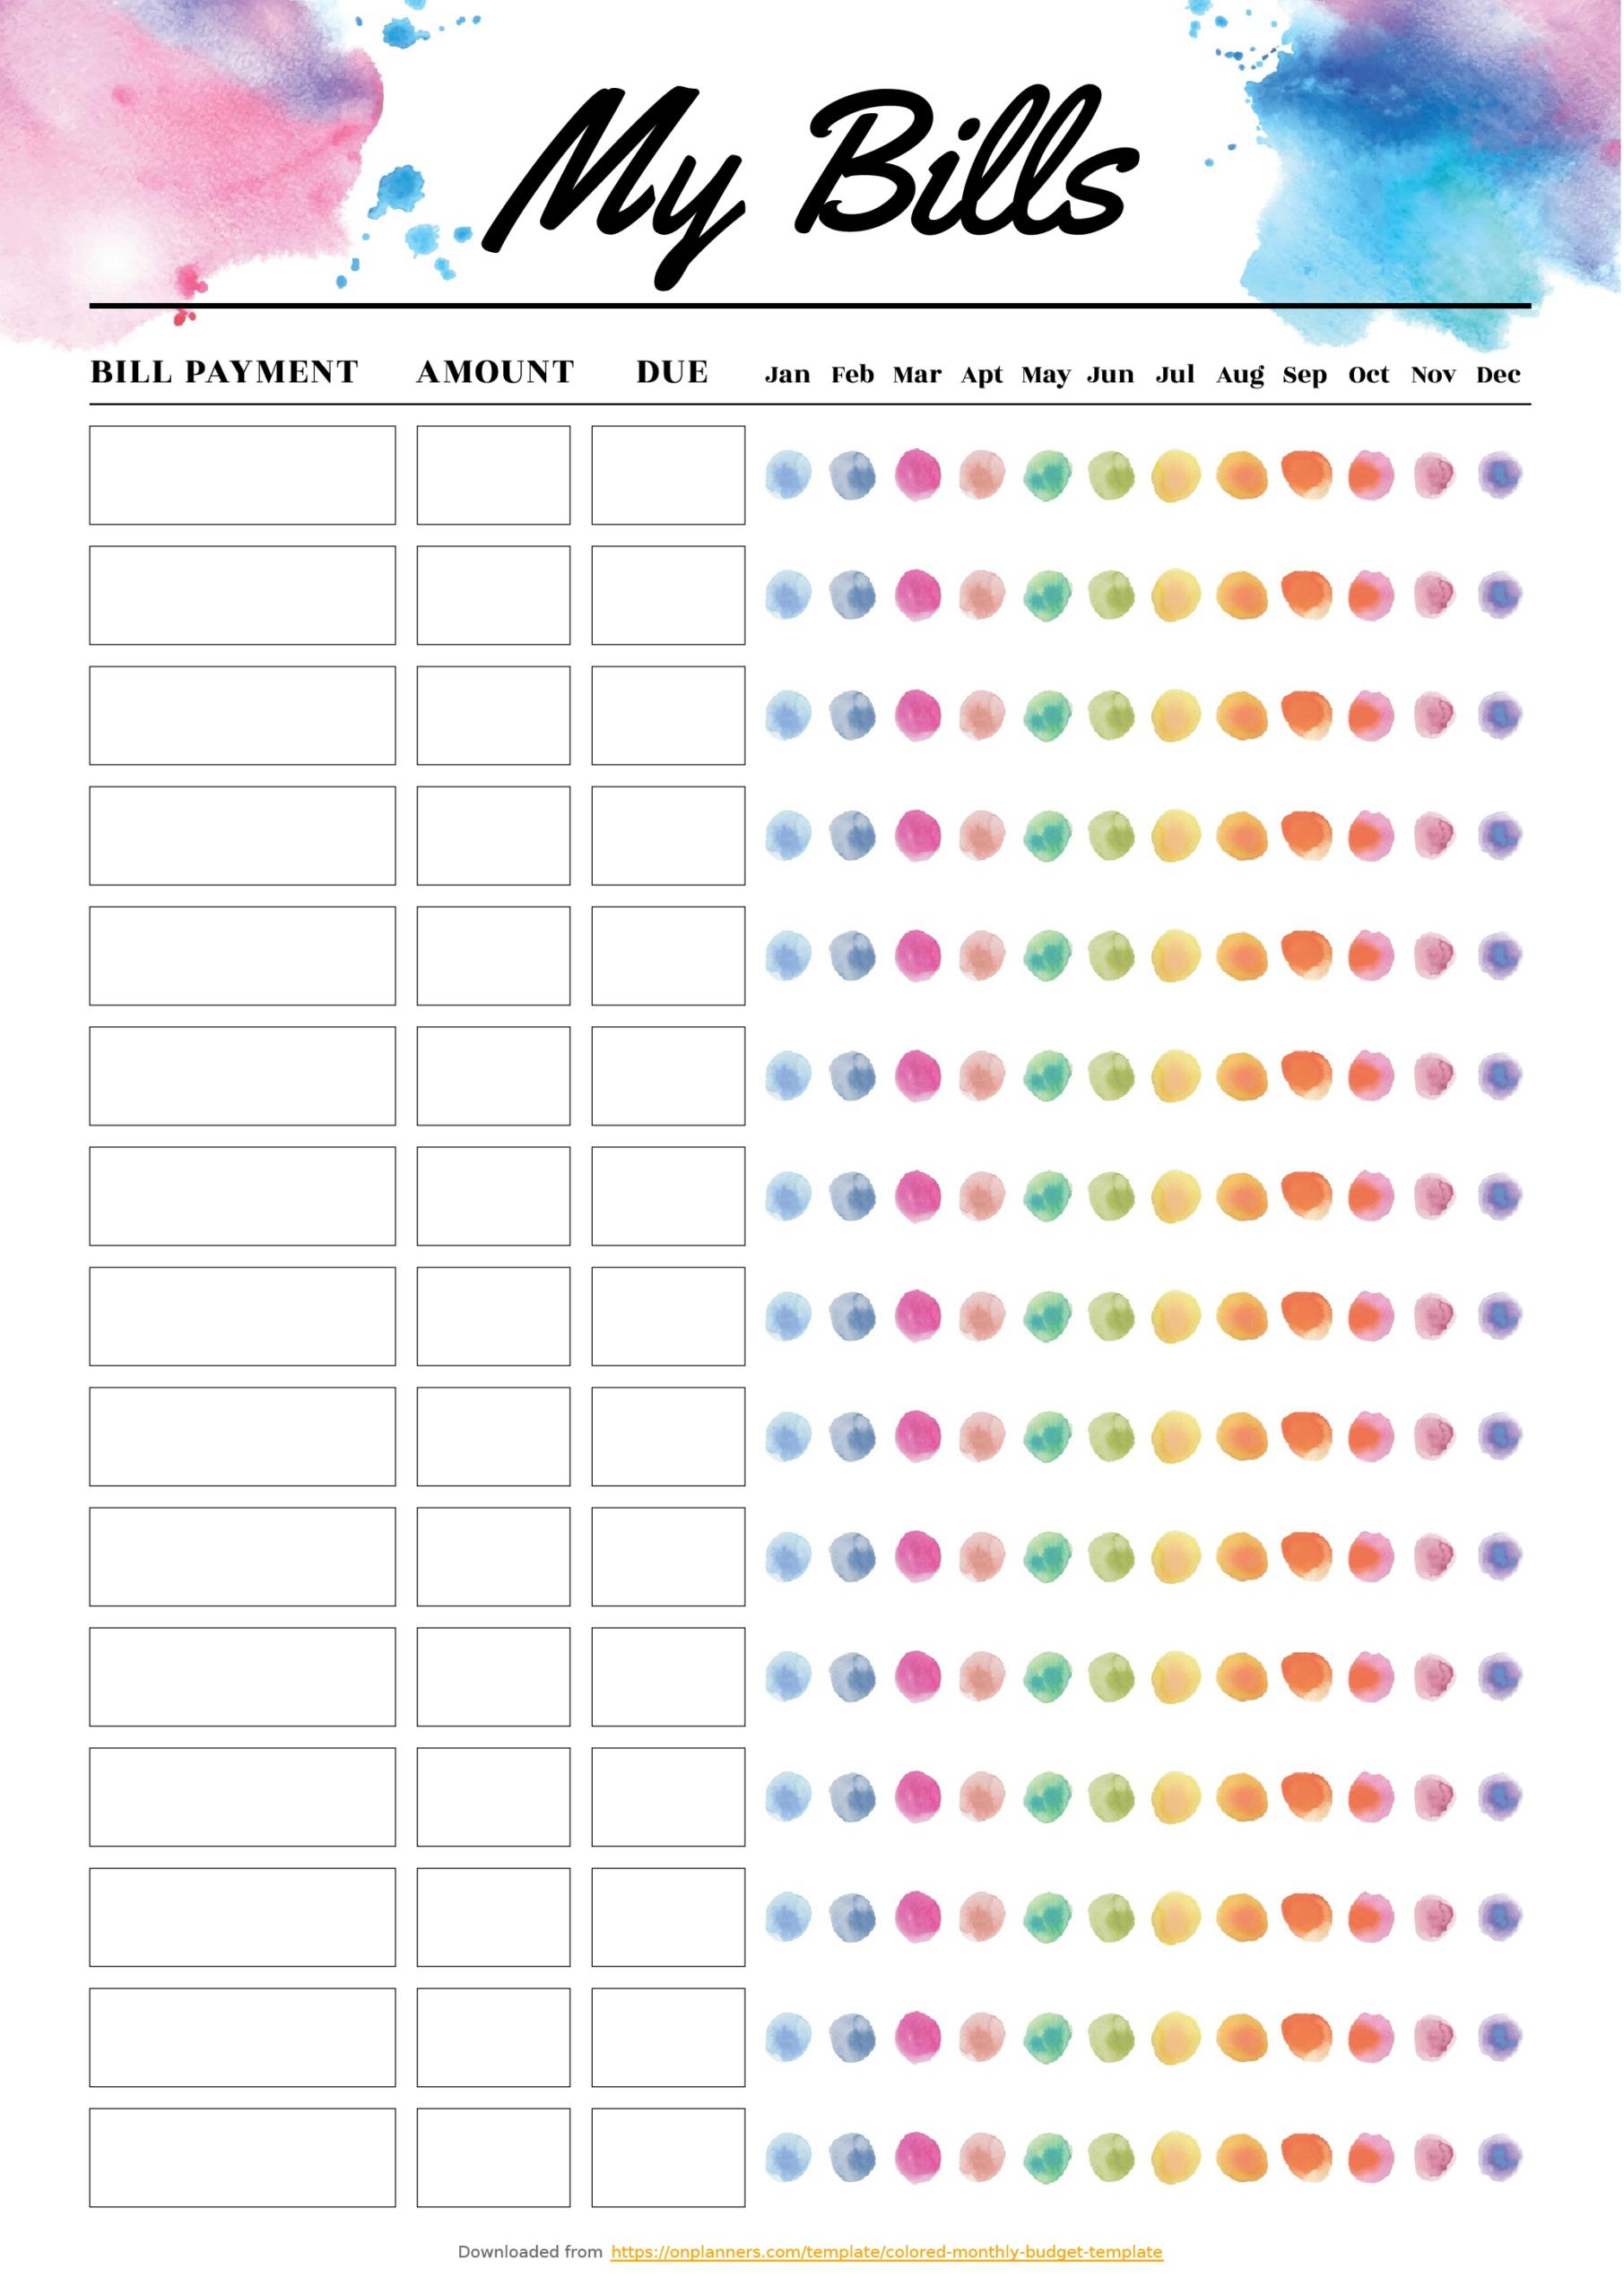 Blank Bill Calendar Printable Colorful - Calendar-Printable Bill Payment Calendar 2021